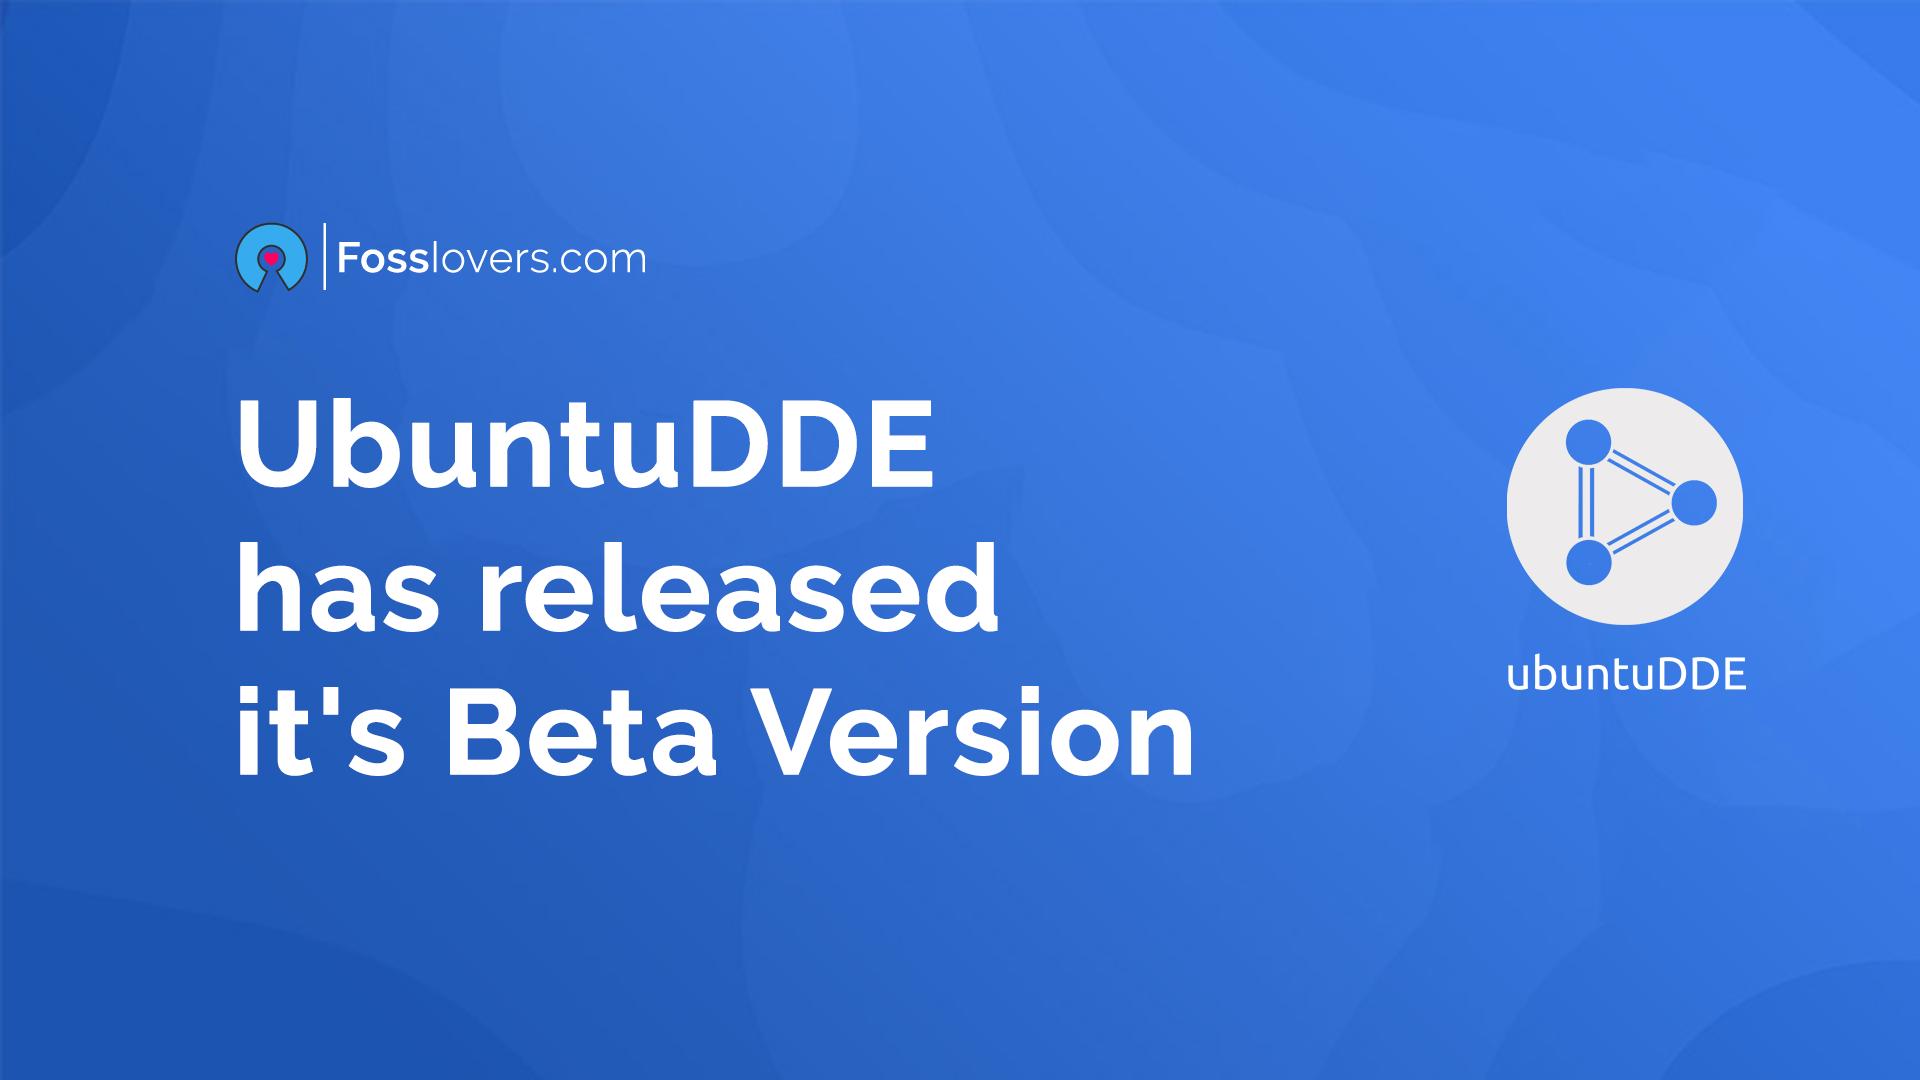 UbuntuDDE has released it's Beta Version